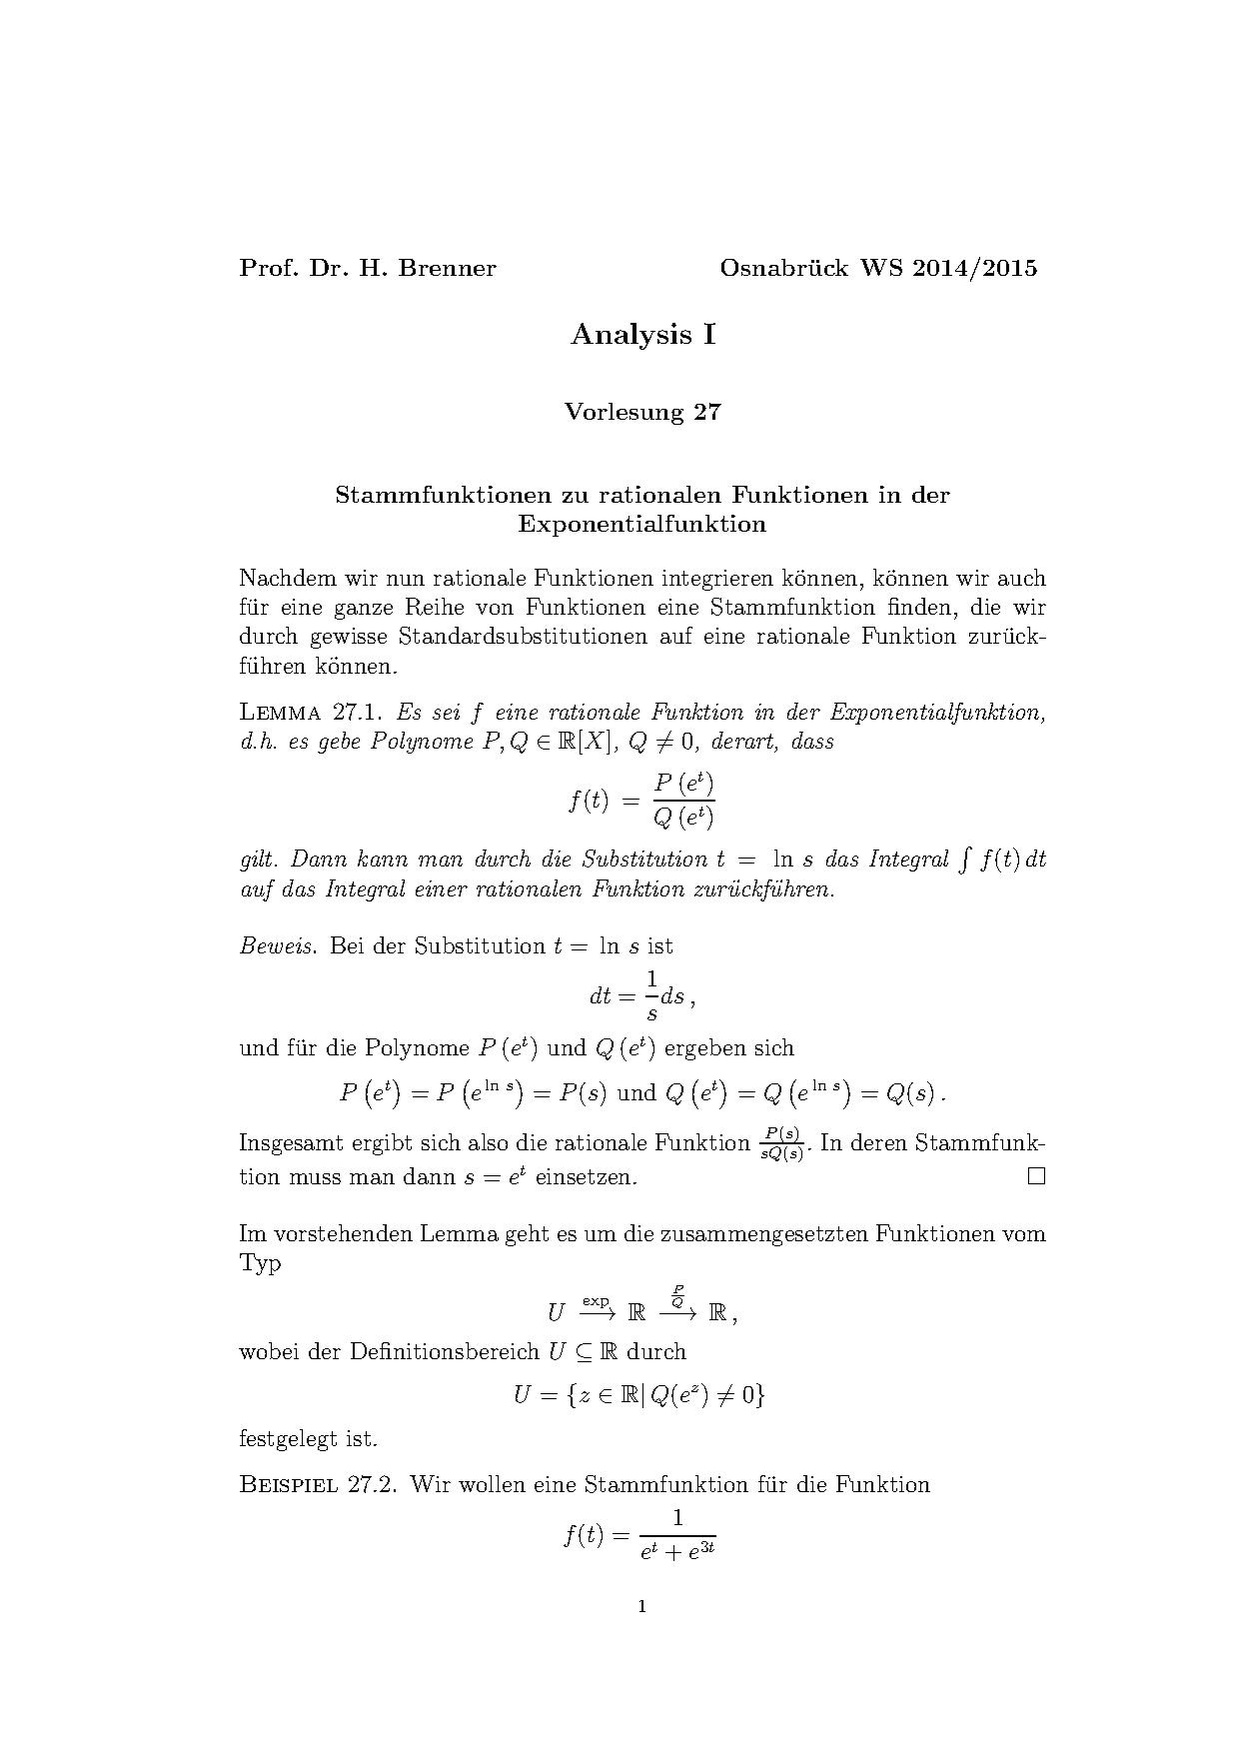 File:Analysis (Osnabrück 2014-2016)Vorlesung27.pdf - Wikimedia Commons